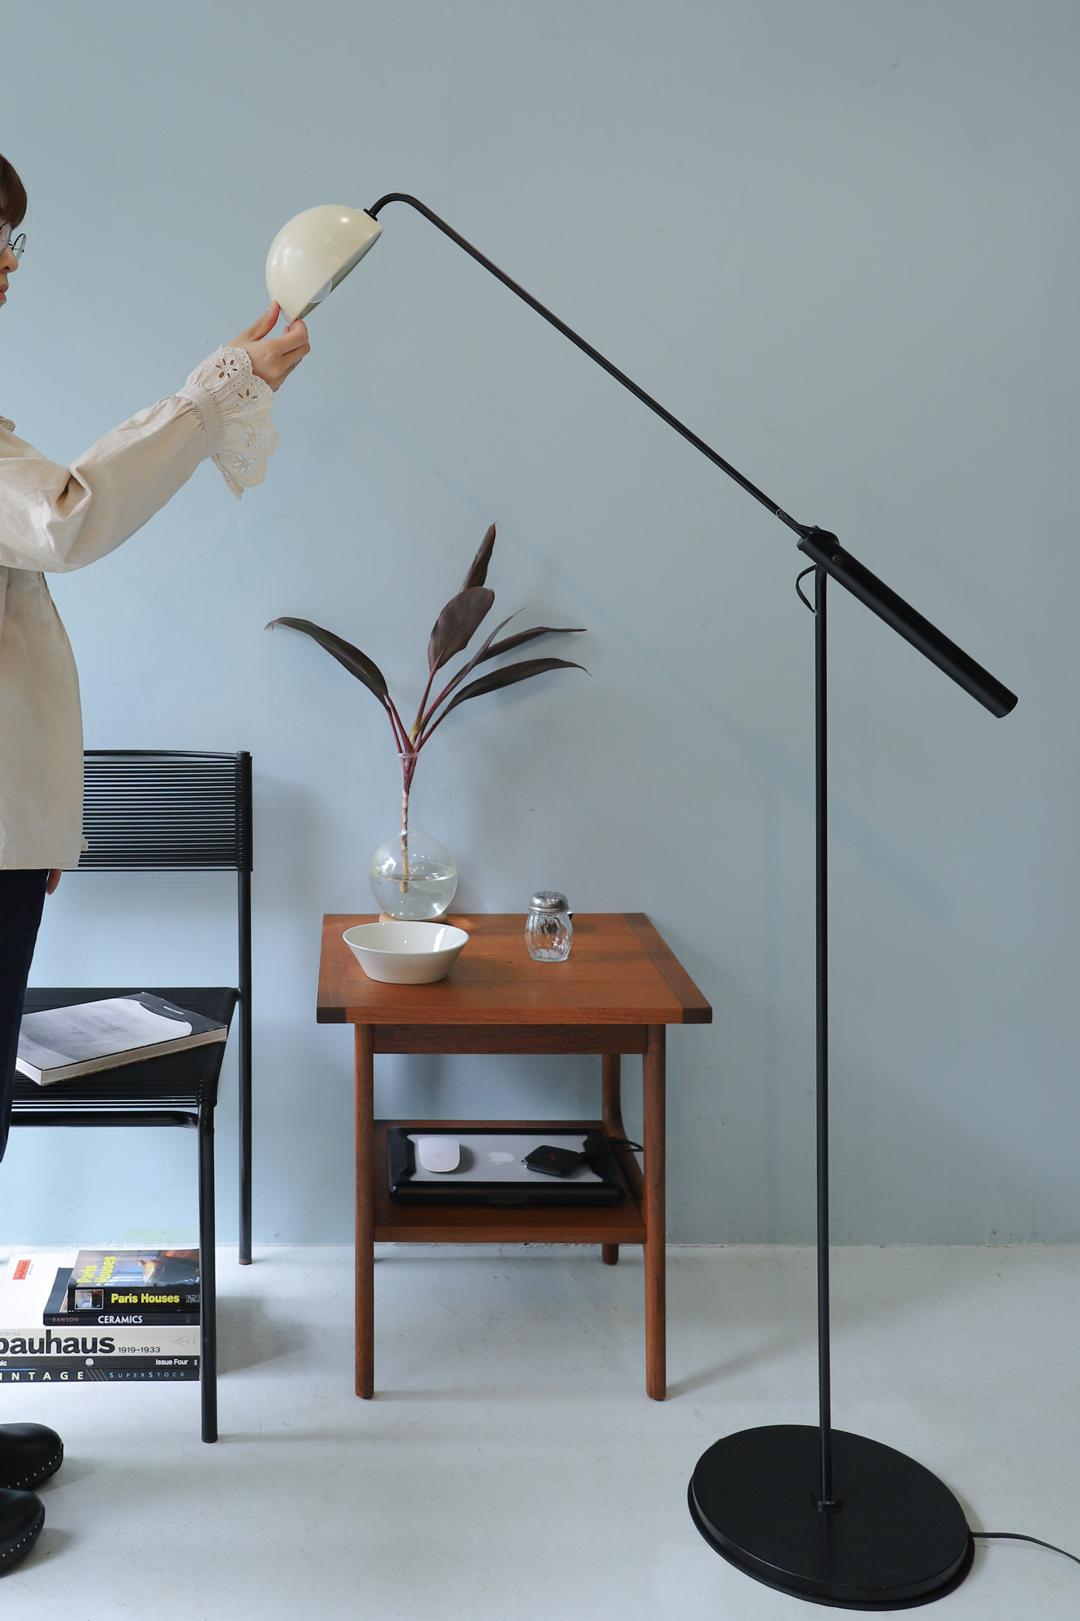 KOIZUMI Floor Stand Light Modern Design/コイズミ フロアスタンド ライト 照明 モダンデザイン